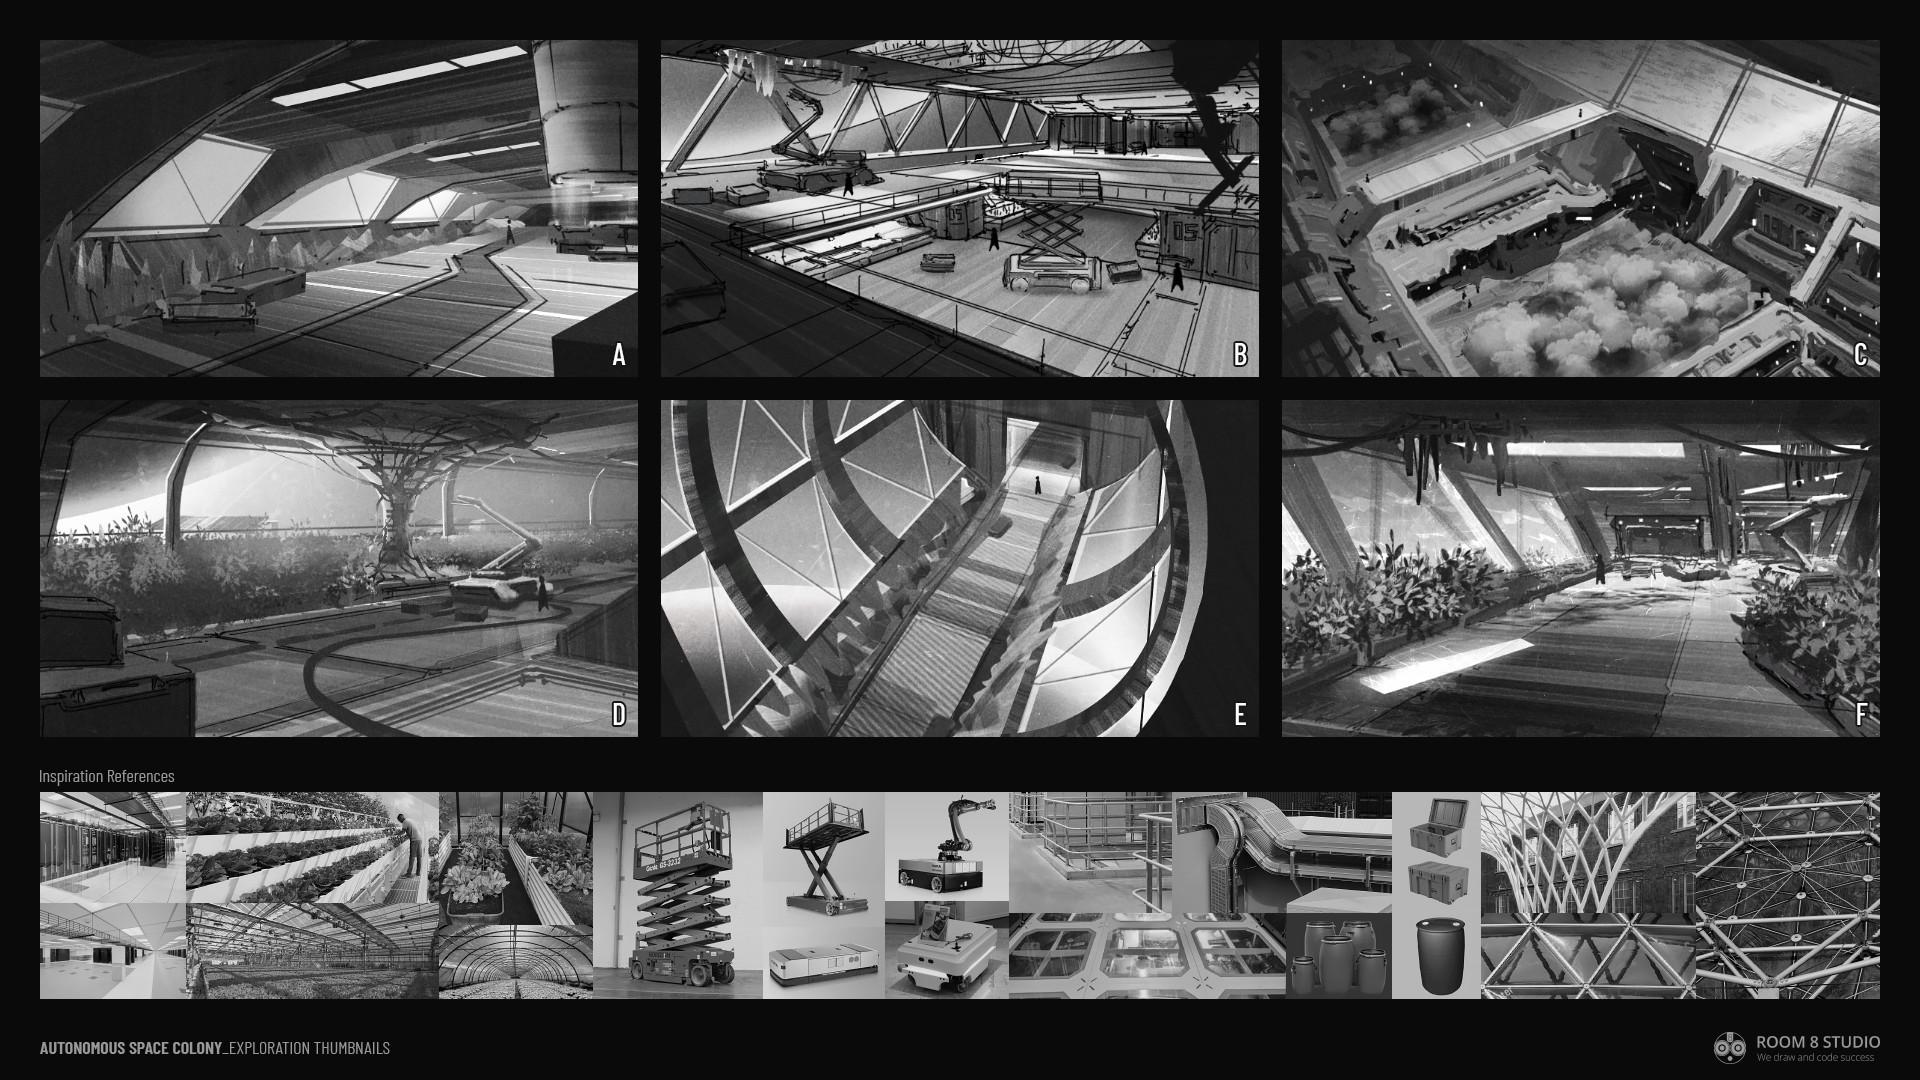 Room 8 studio room8 portfolio environment space colony 02 thumbnails 22082018